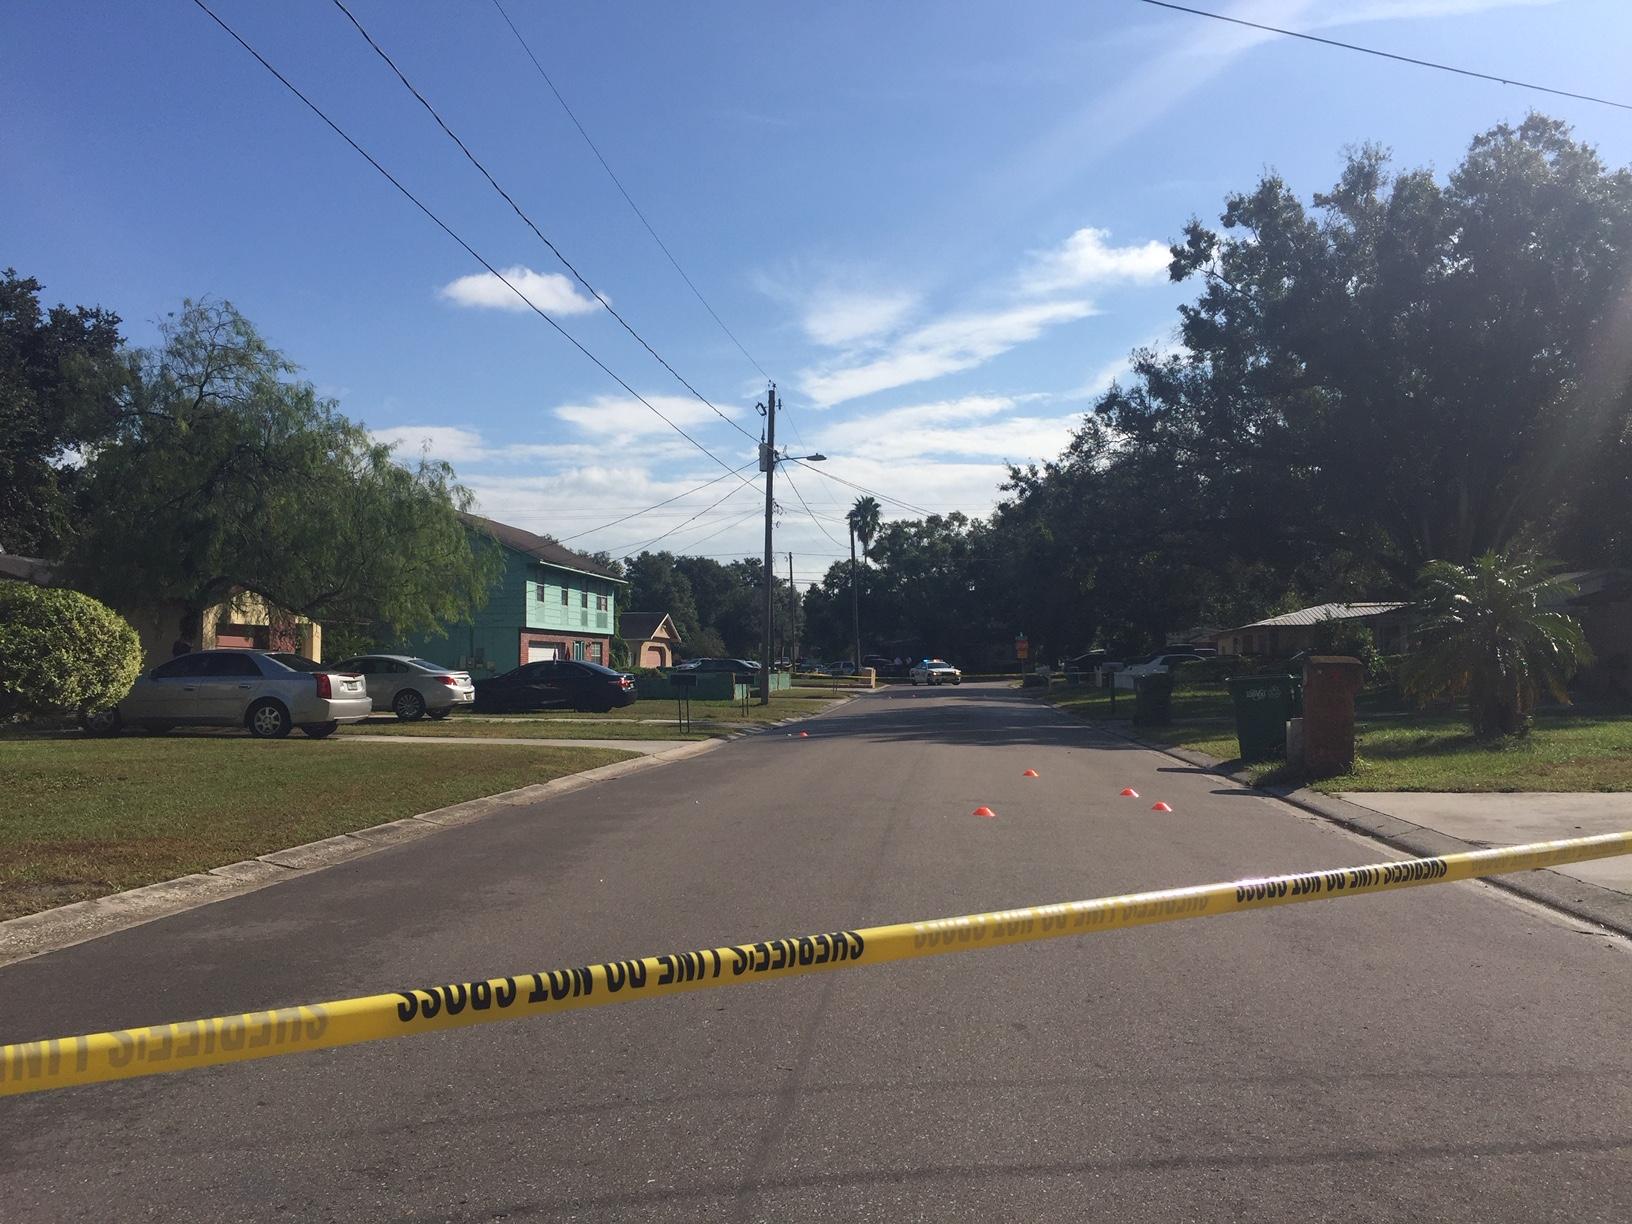 1 person shot in Tampa neighborhood, school on lock-in